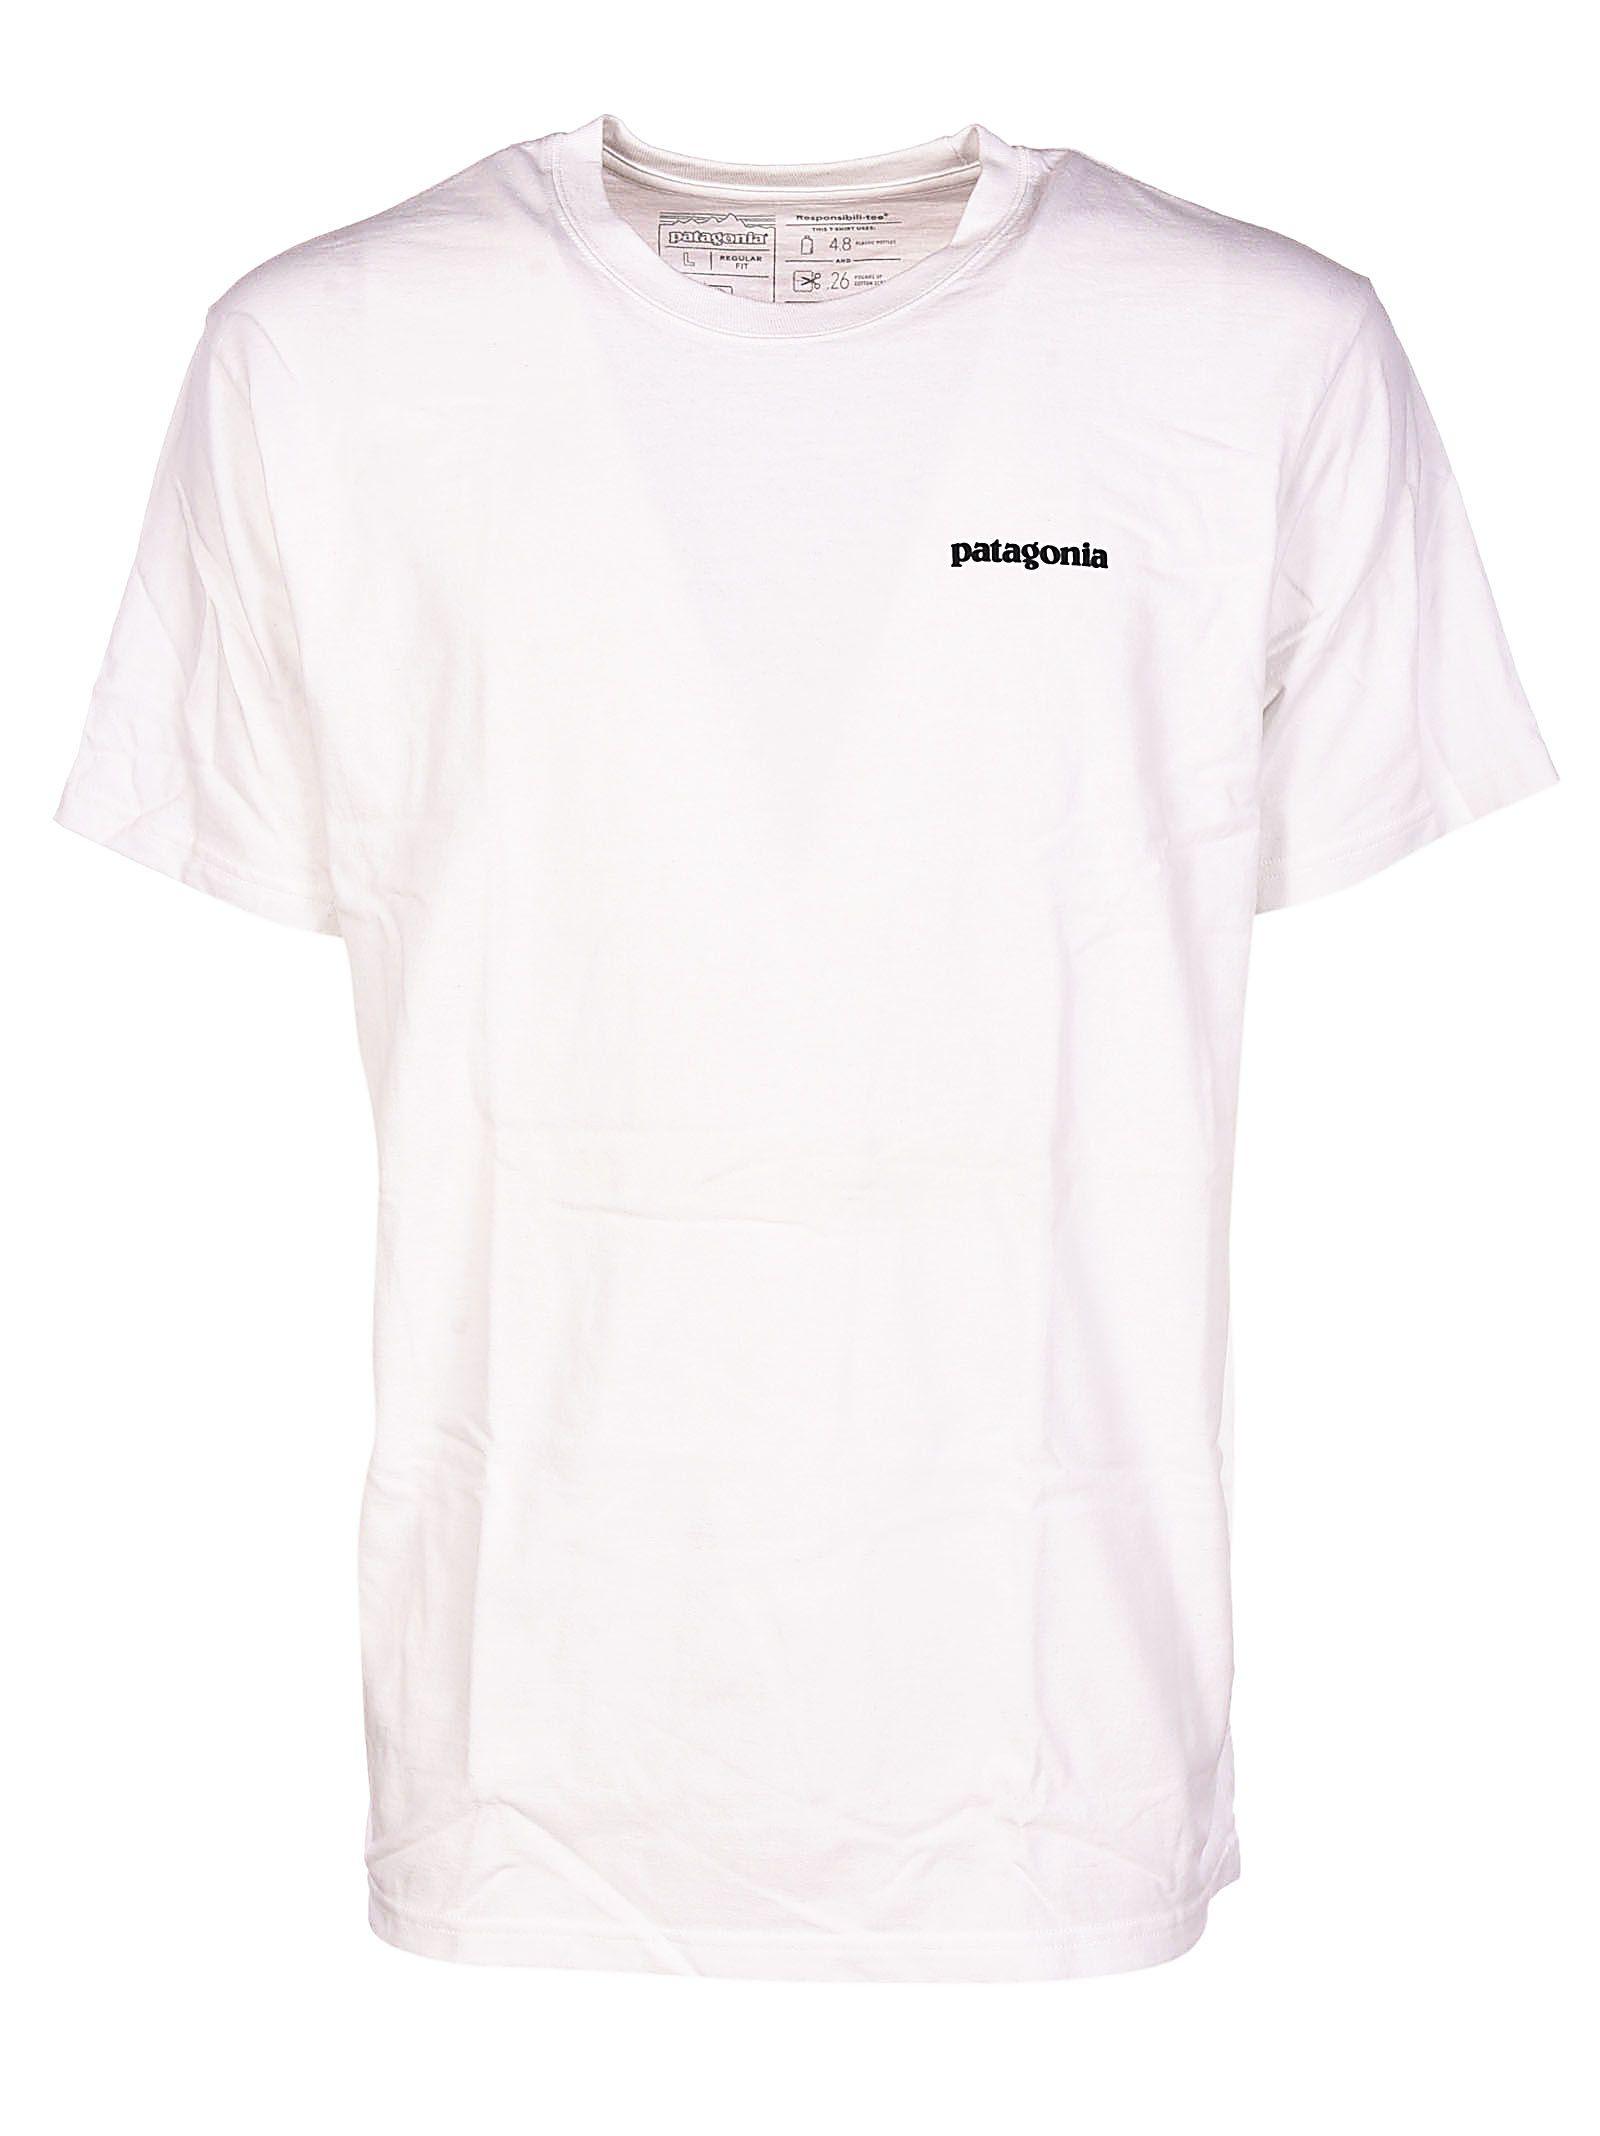 Topwear Polo Shirts Patagonia Cheap Sale Reliable Amazon Online Free